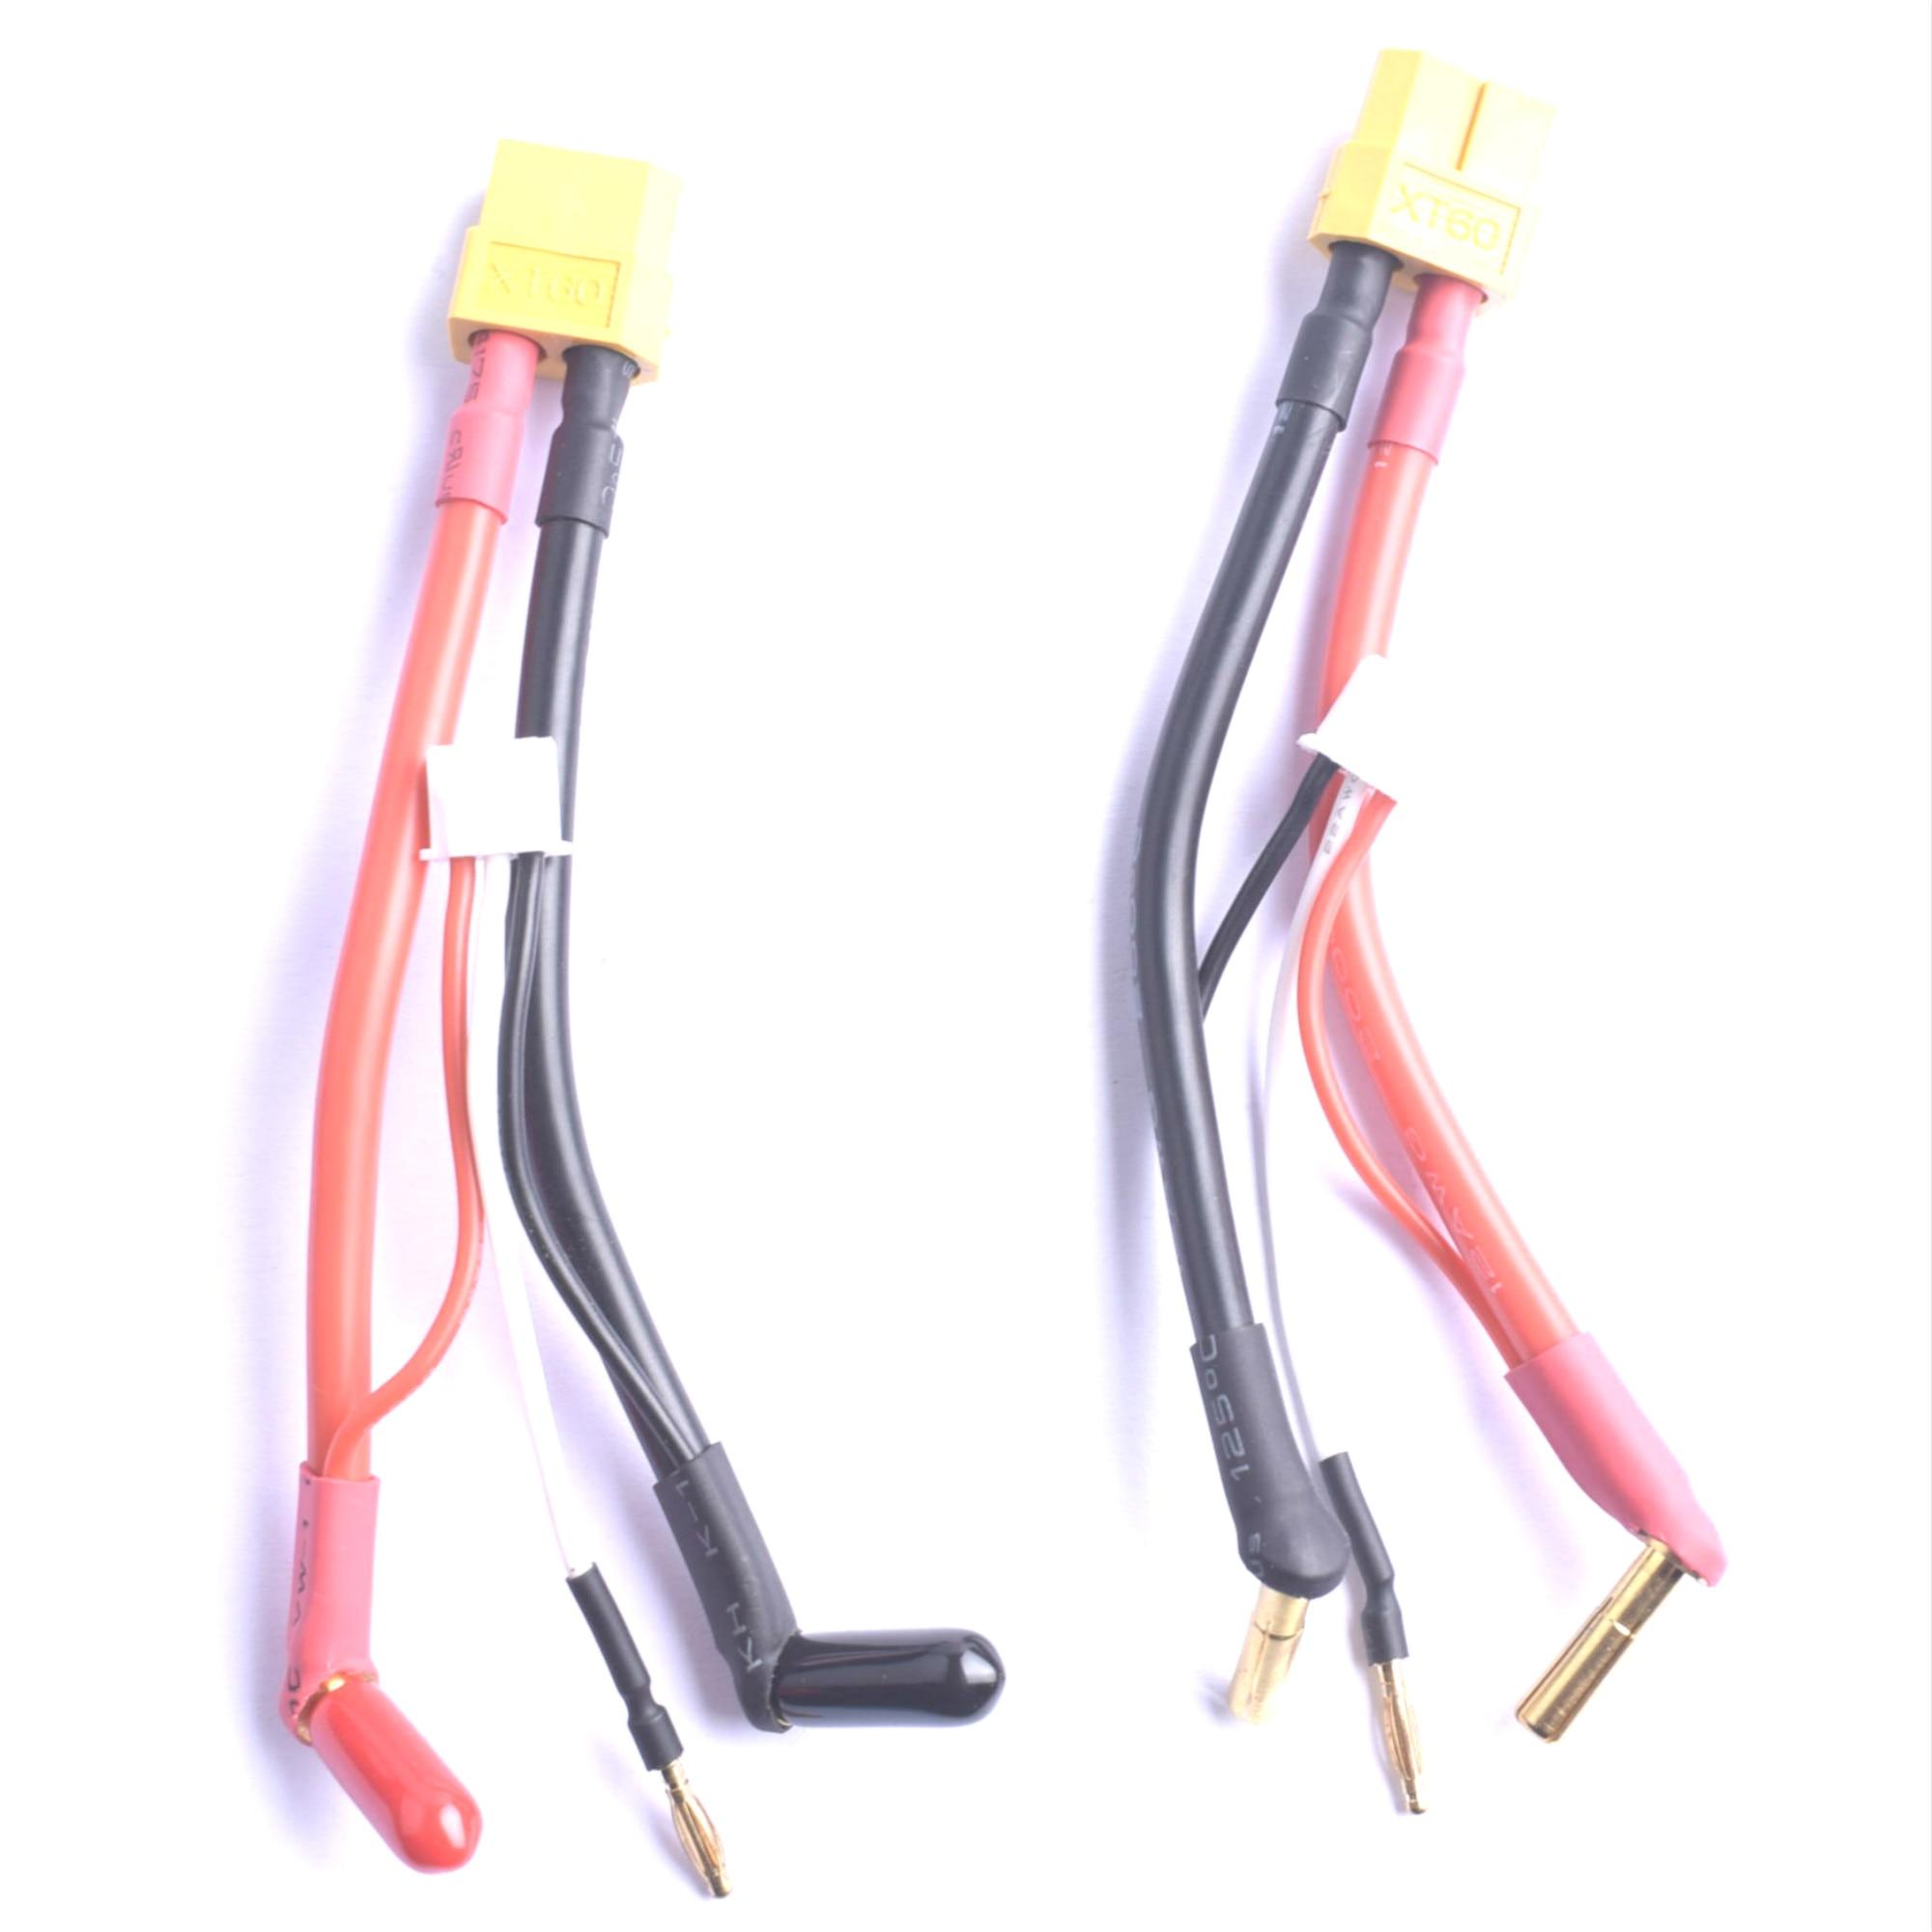 Harness lipo hardcase 2 s jst xh equilíbrio xt60 tamiya deans ec3 ec5hxt traxxas plug a 90 graus 4.0mm conector de bala com capa